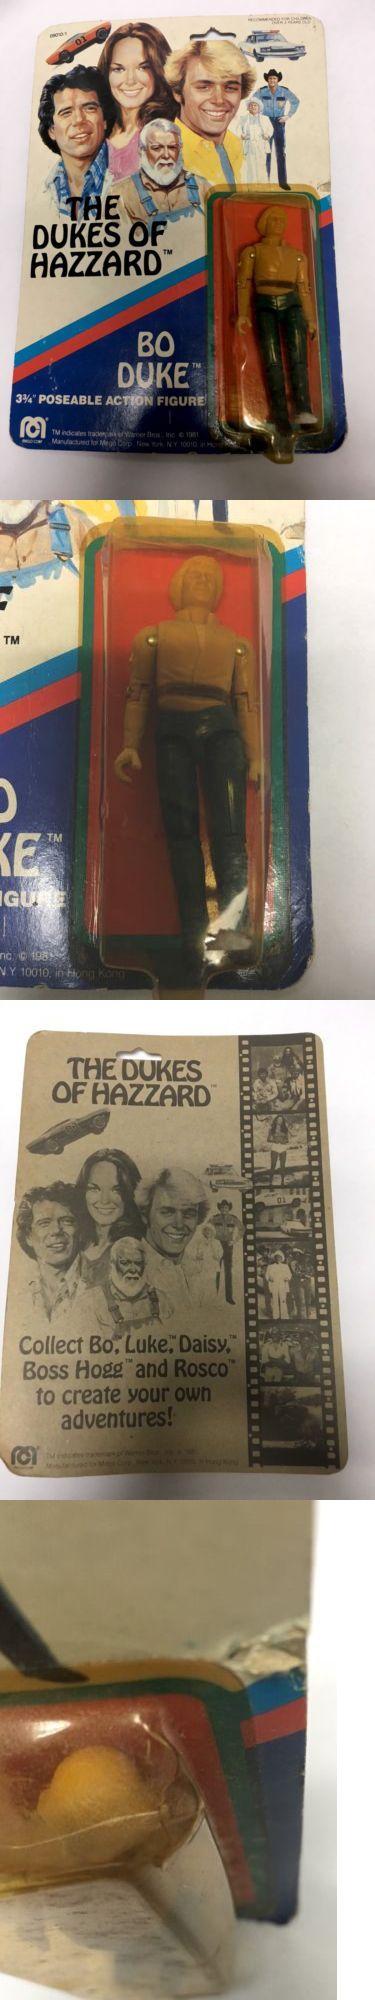 Dukes of Hazzard 20908: 1981 Mego Corp. The Dukes Of Hazard Bo Duke Action Figure -> BUY IT NOW ONLY: $30 on eBay!